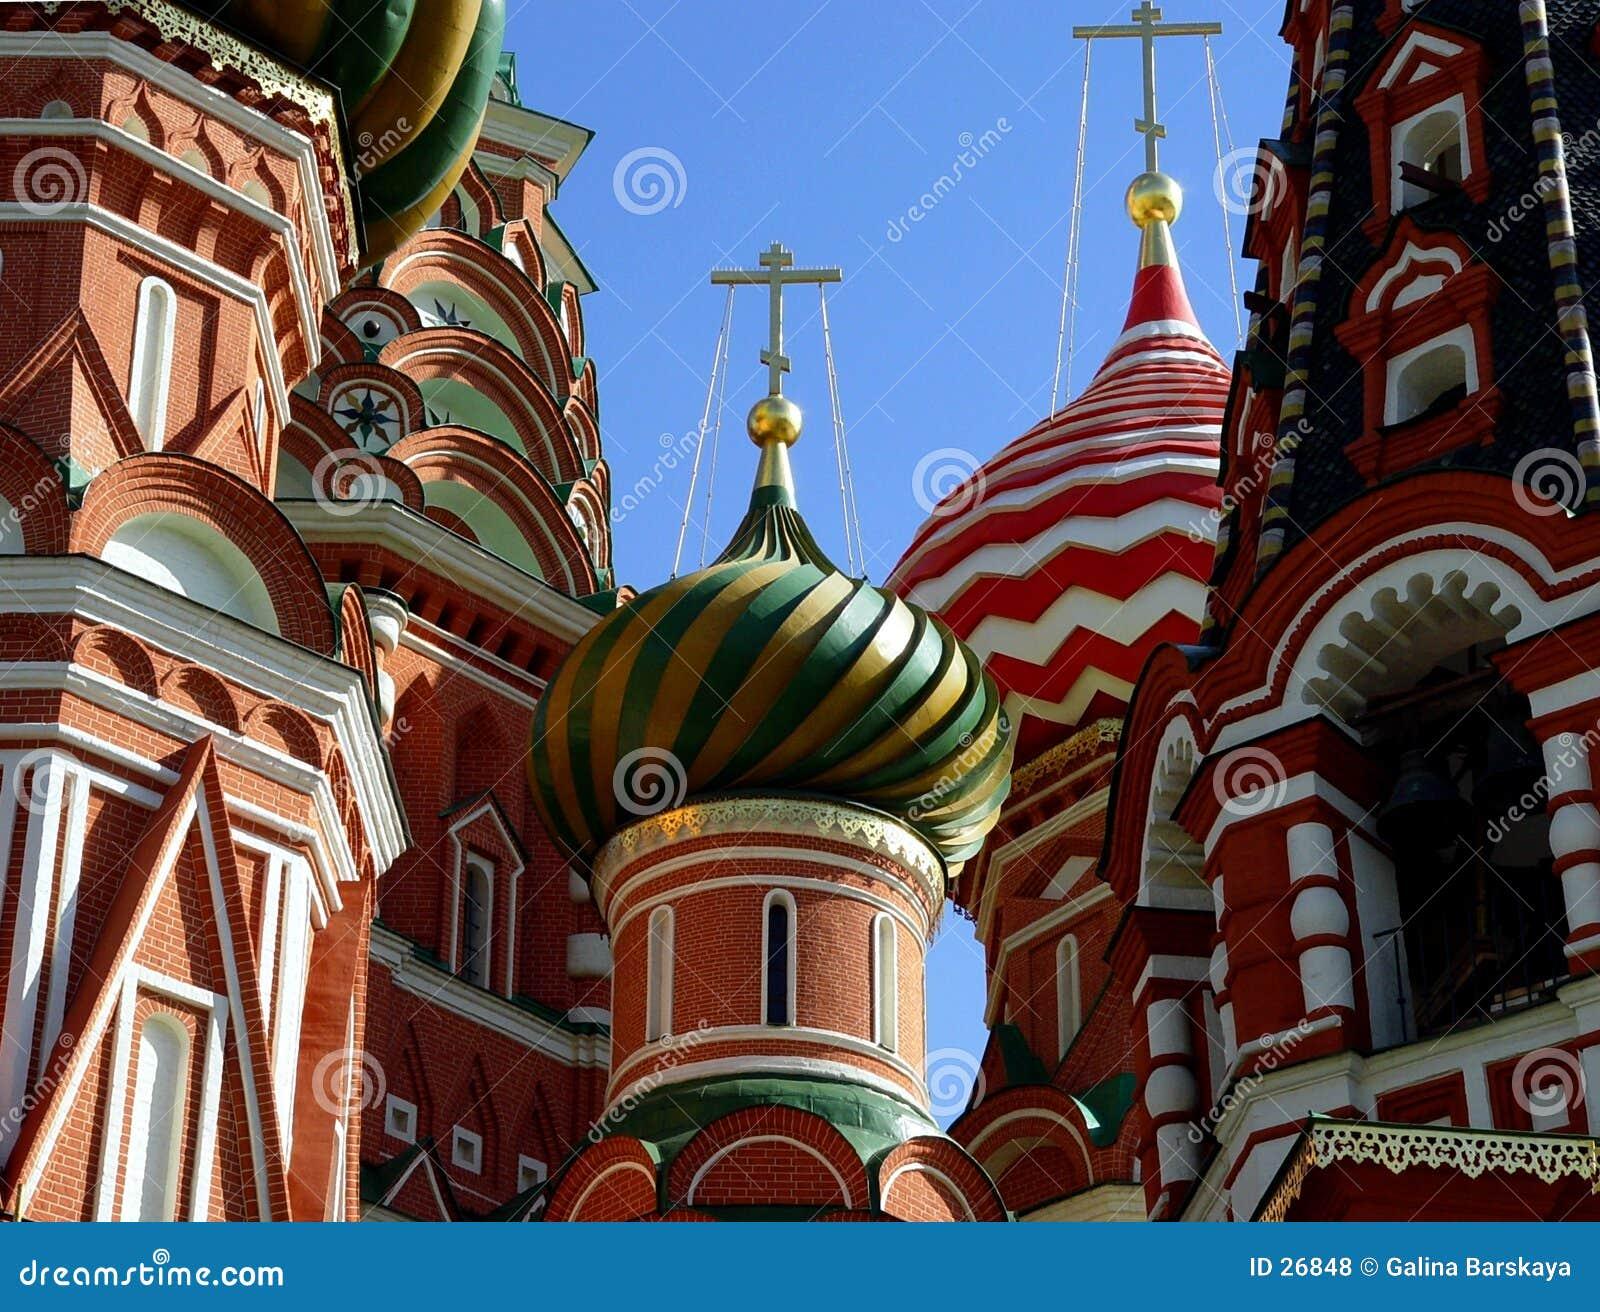 Str. Basilikum-Kathedrale, Moskau, Russland